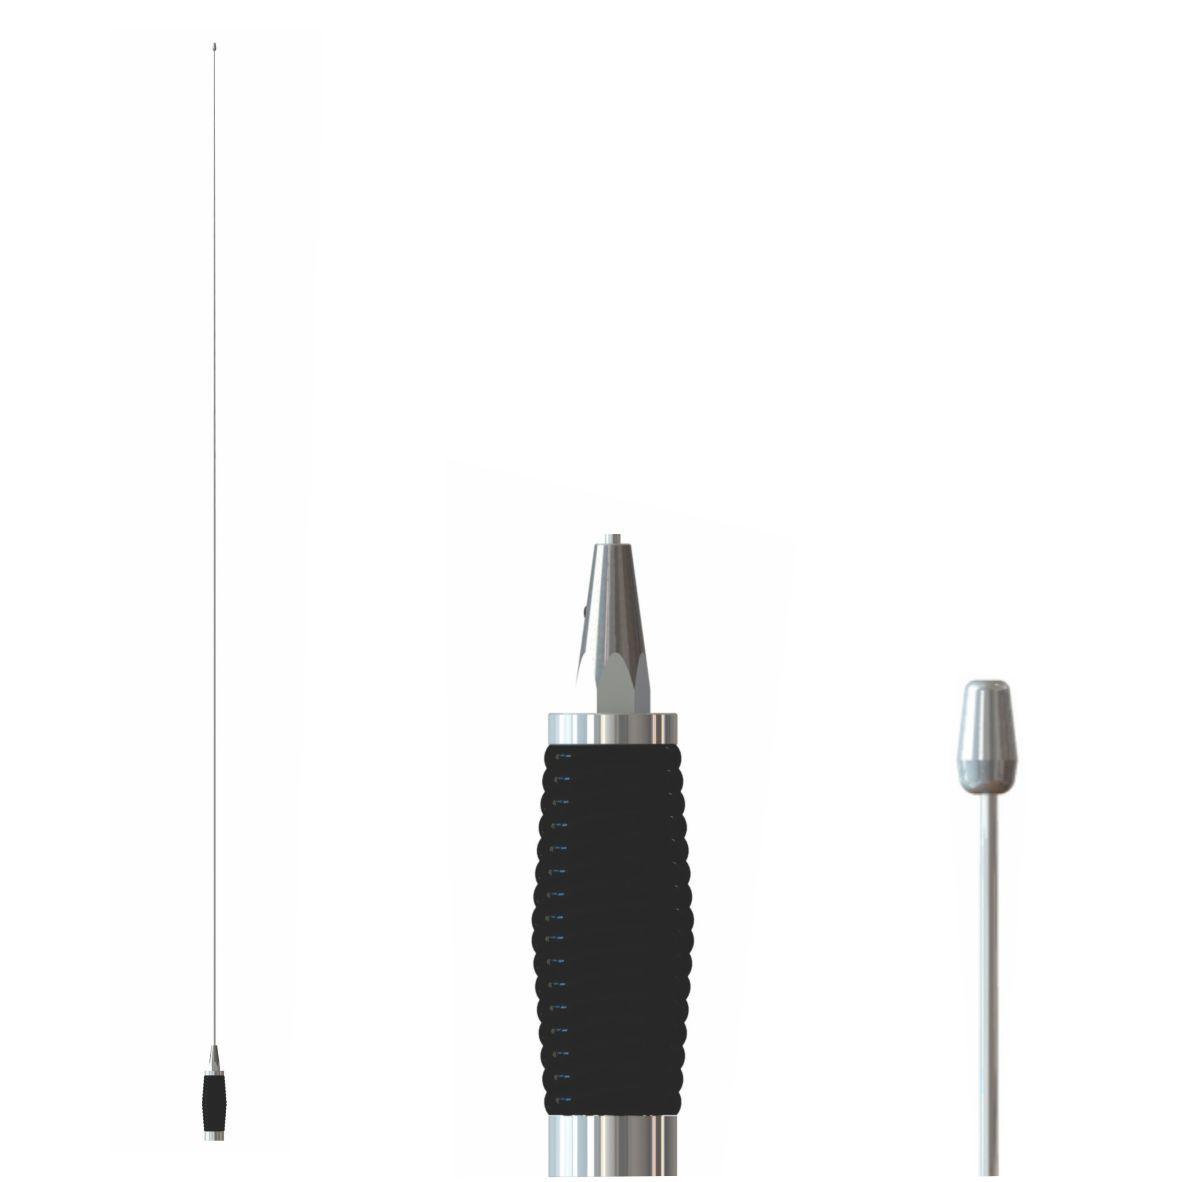 Antena Mini Maria Mole PX 1/4 De Onda Steelbras - AP5000